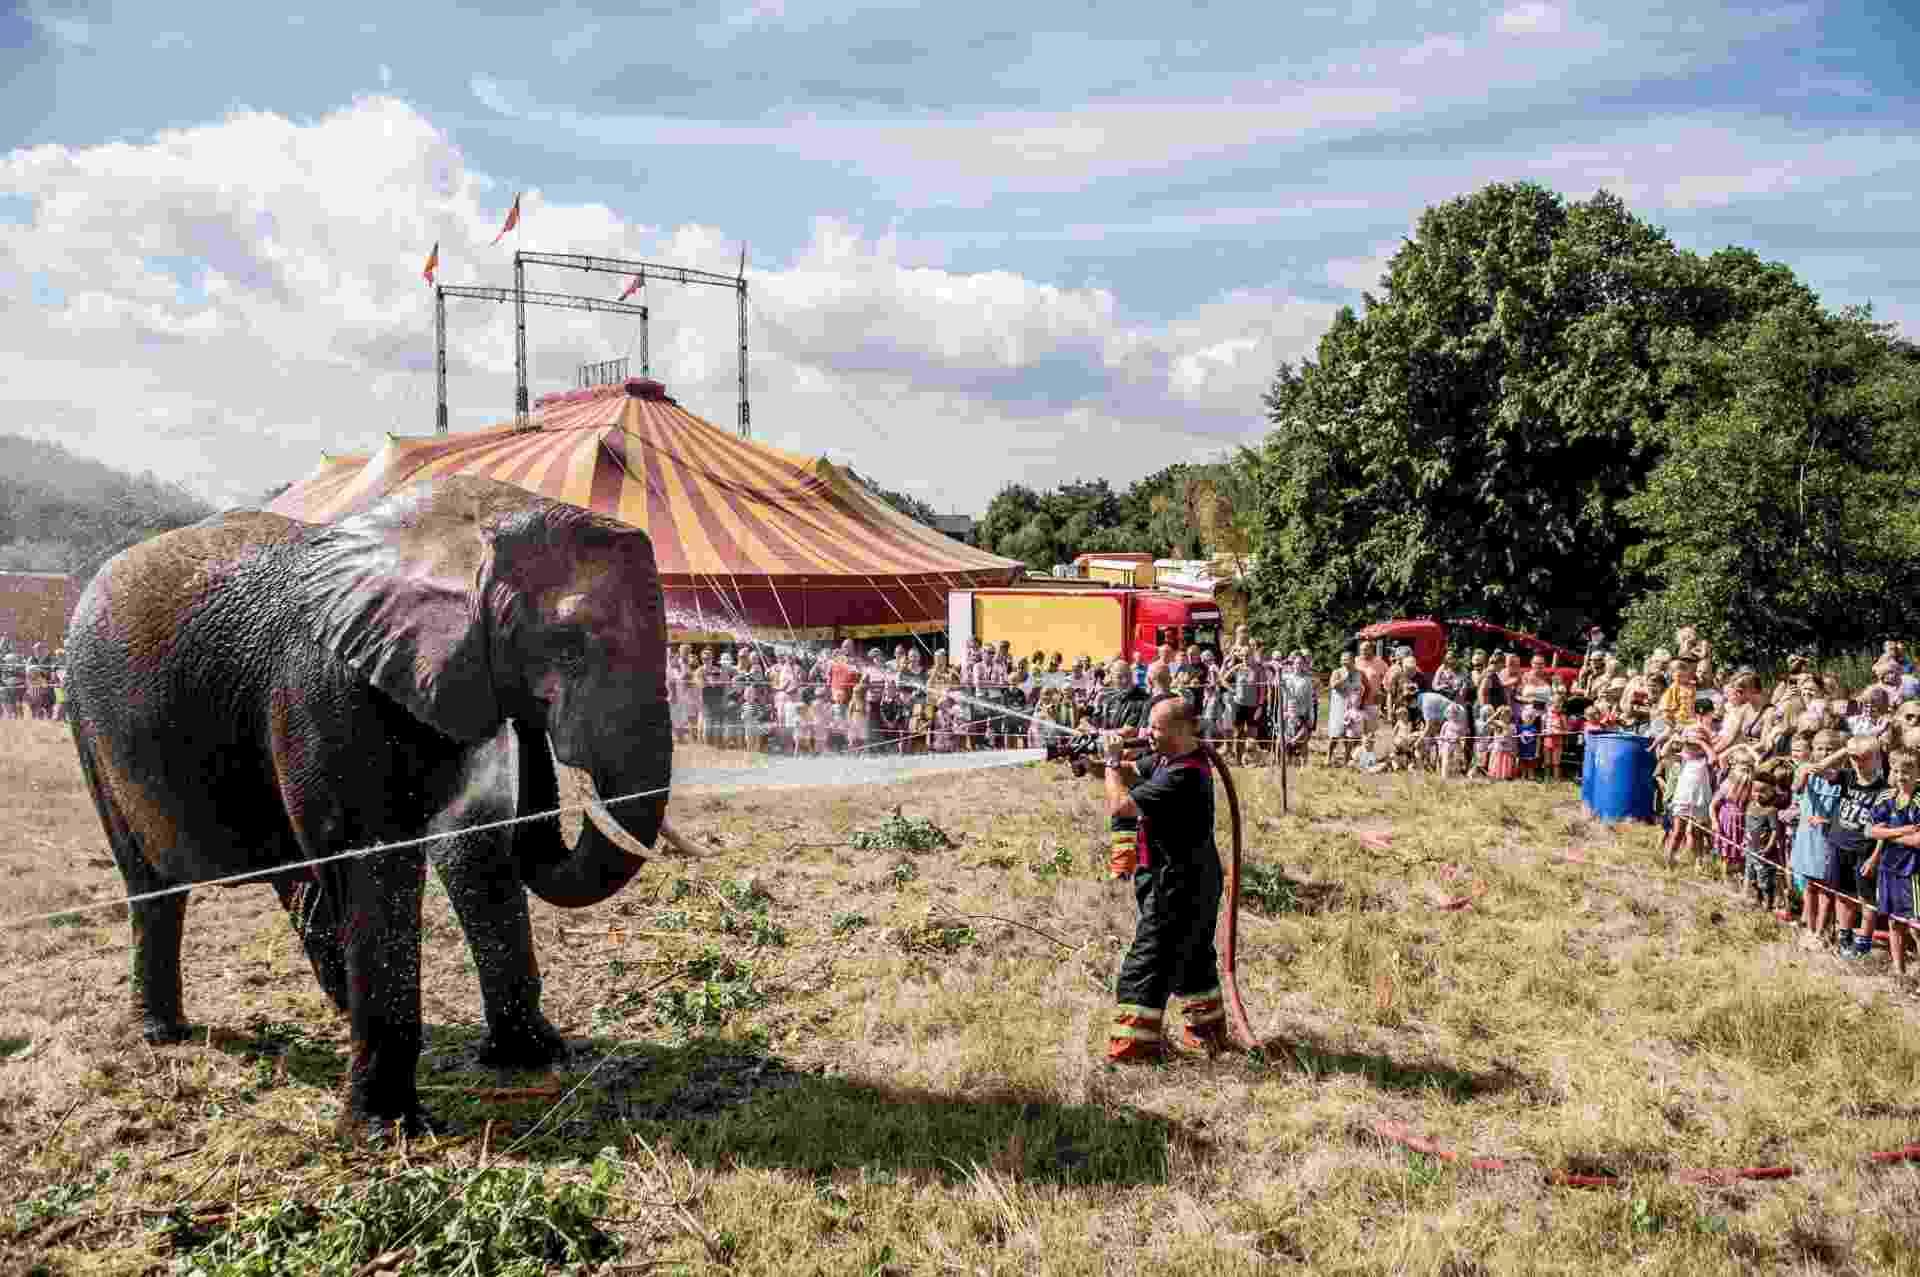 2.ago.2018 - Bombeiro refresca elefante na Dinamarca - Ritzau Scanpix / Mads Claus Rasmussen / AFP